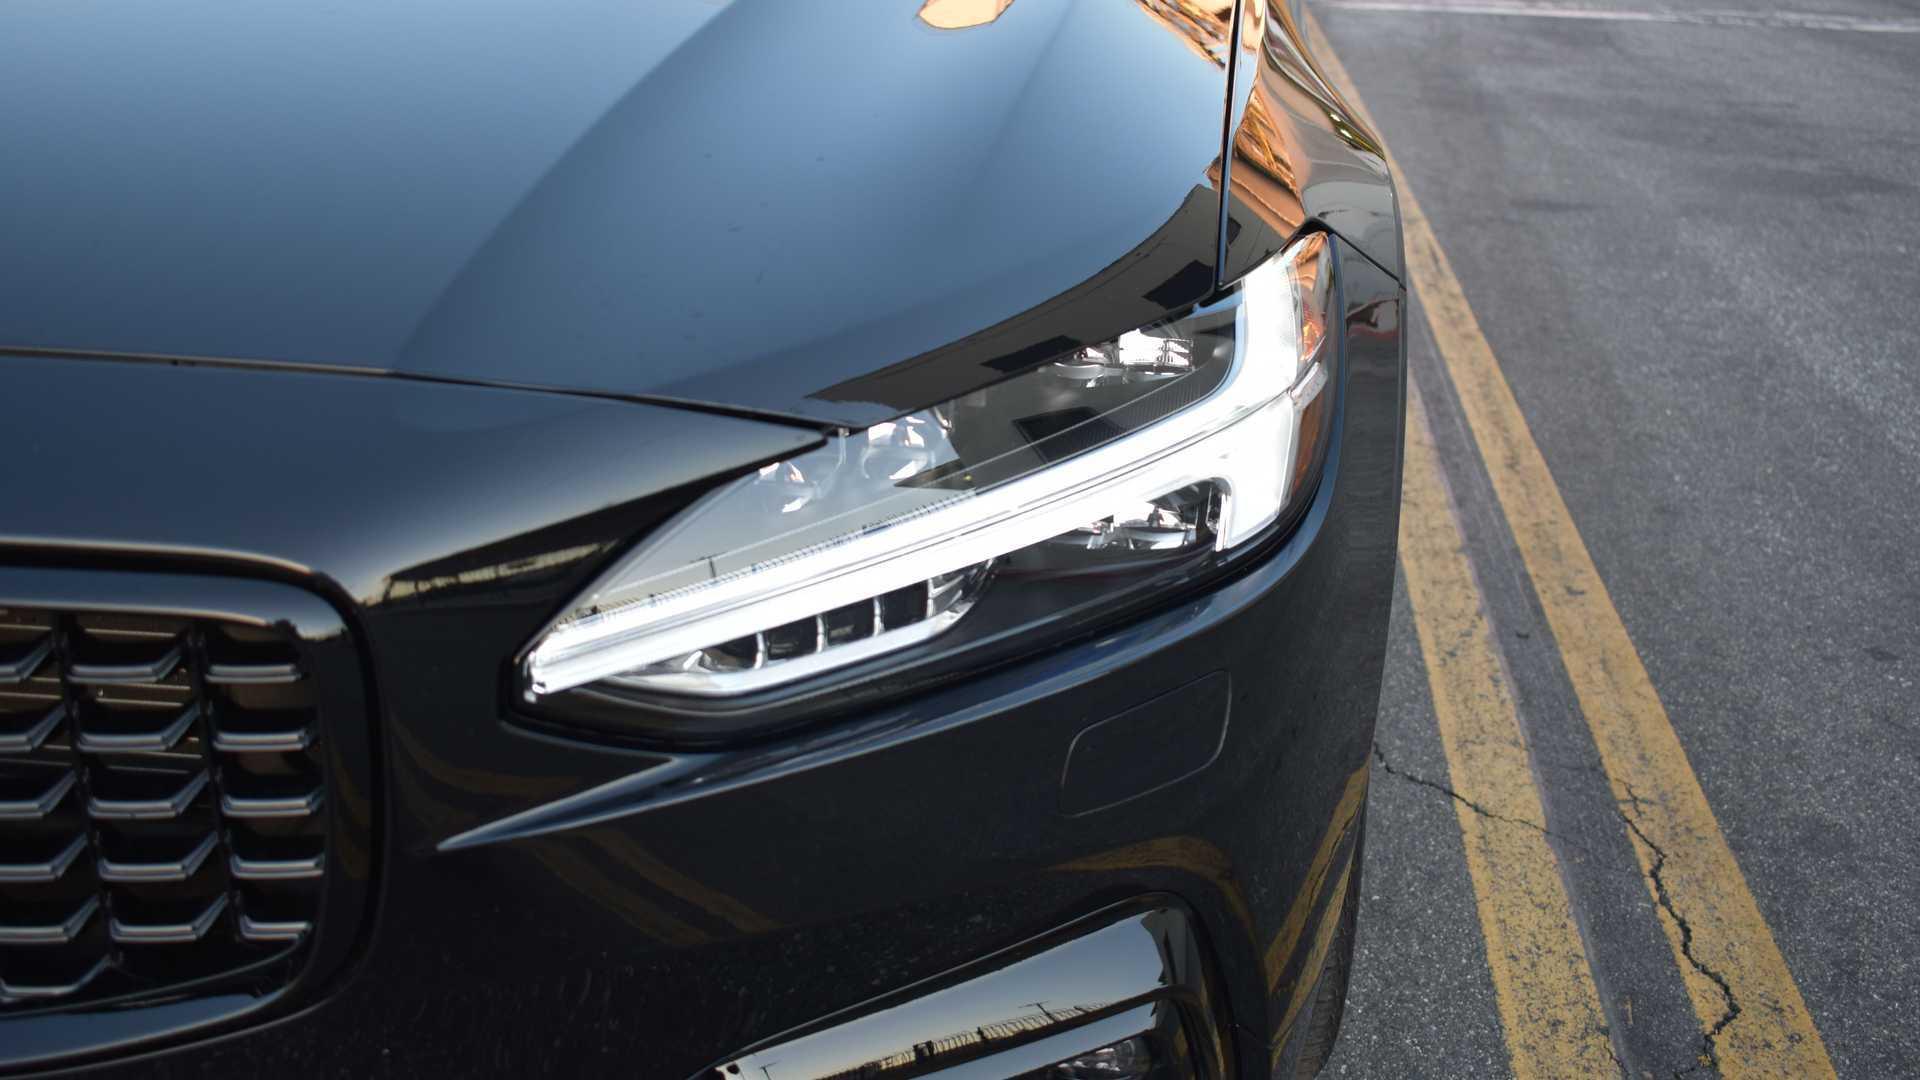 2021-volvo-v90-t6-r-design-awd-exterior-headlight.jpg